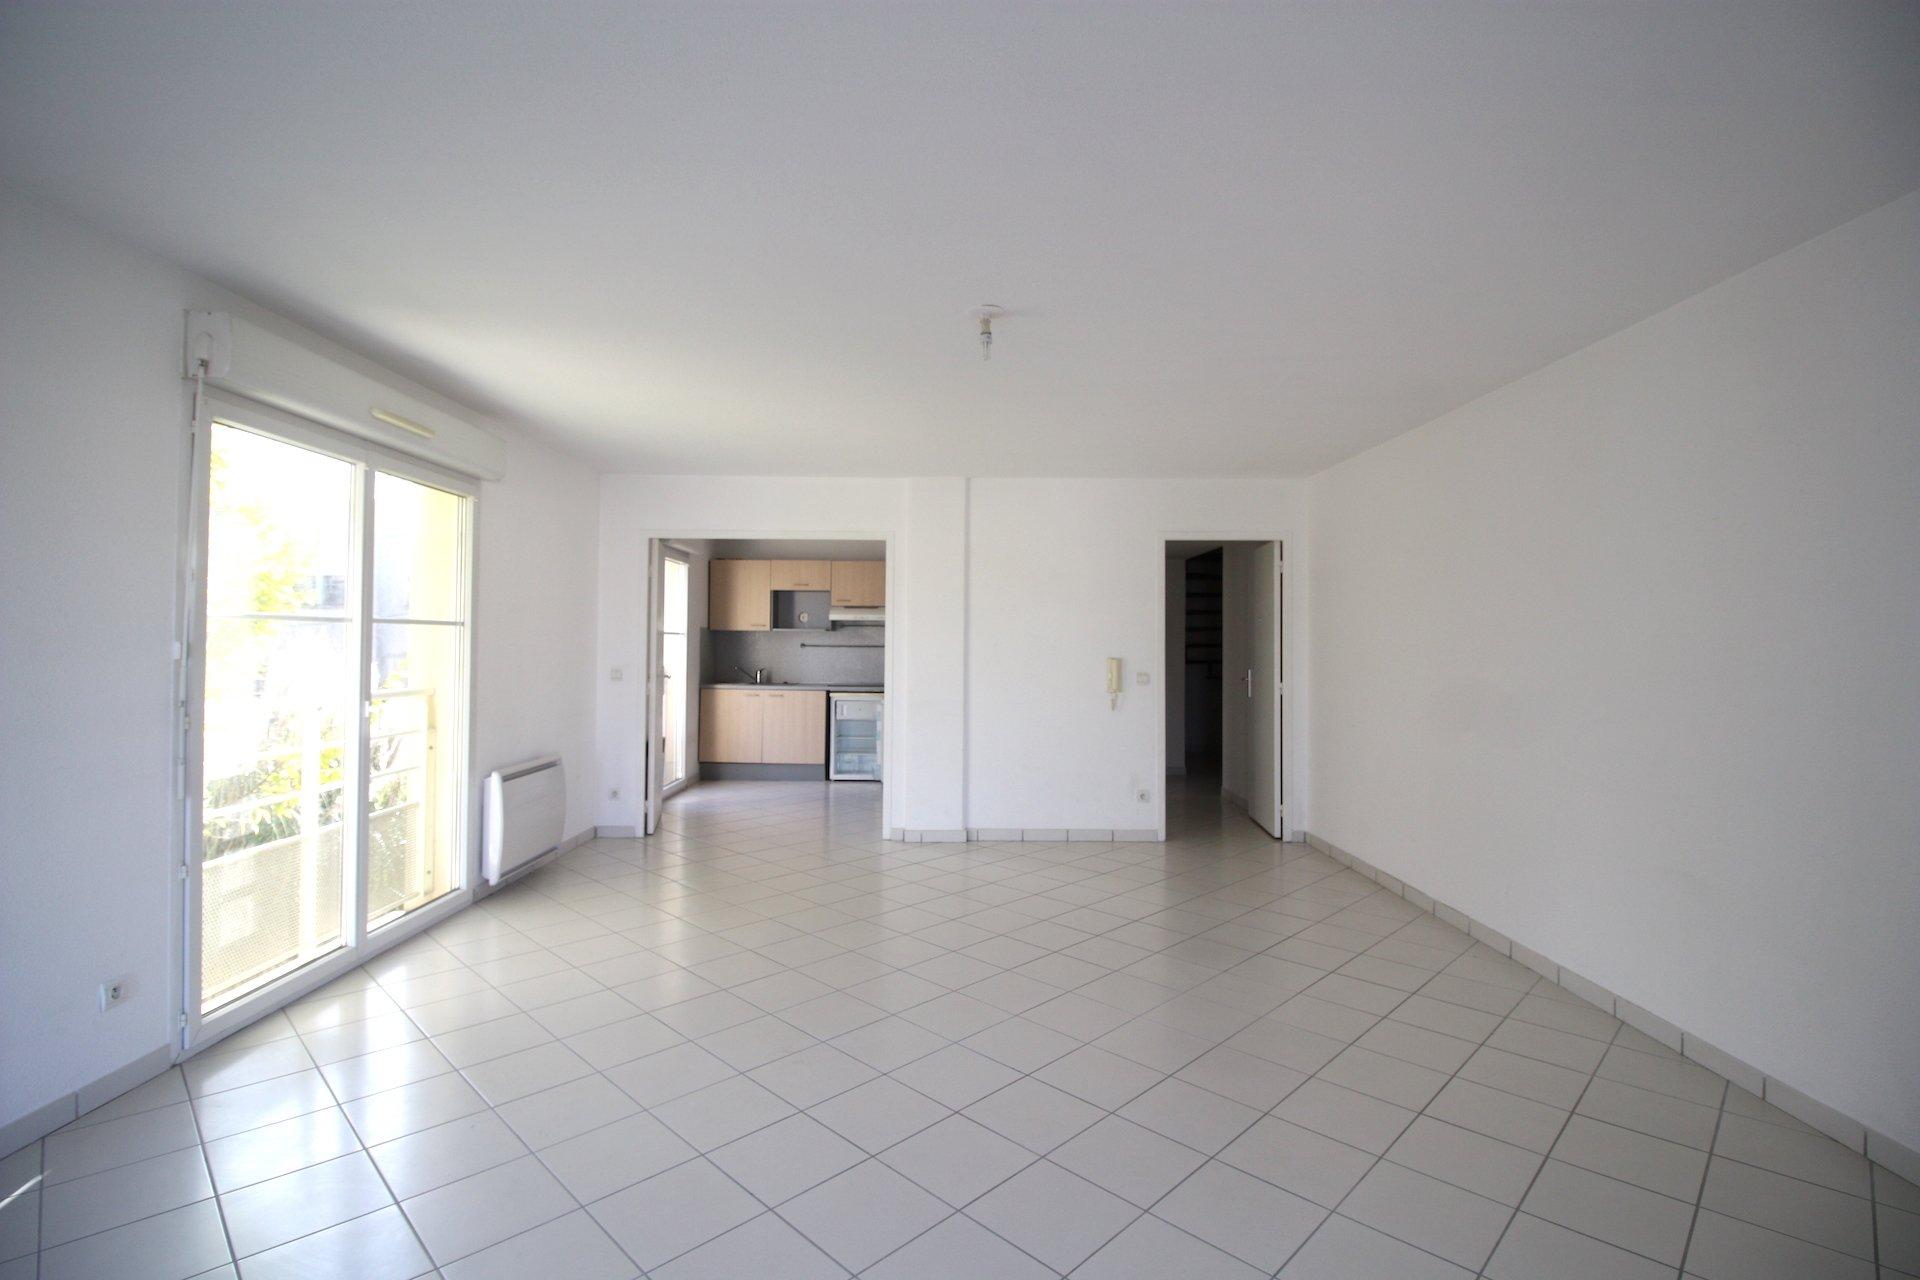 Pessac – Bel appartement de 93 m2 en duplex avec terrasse de 48m2